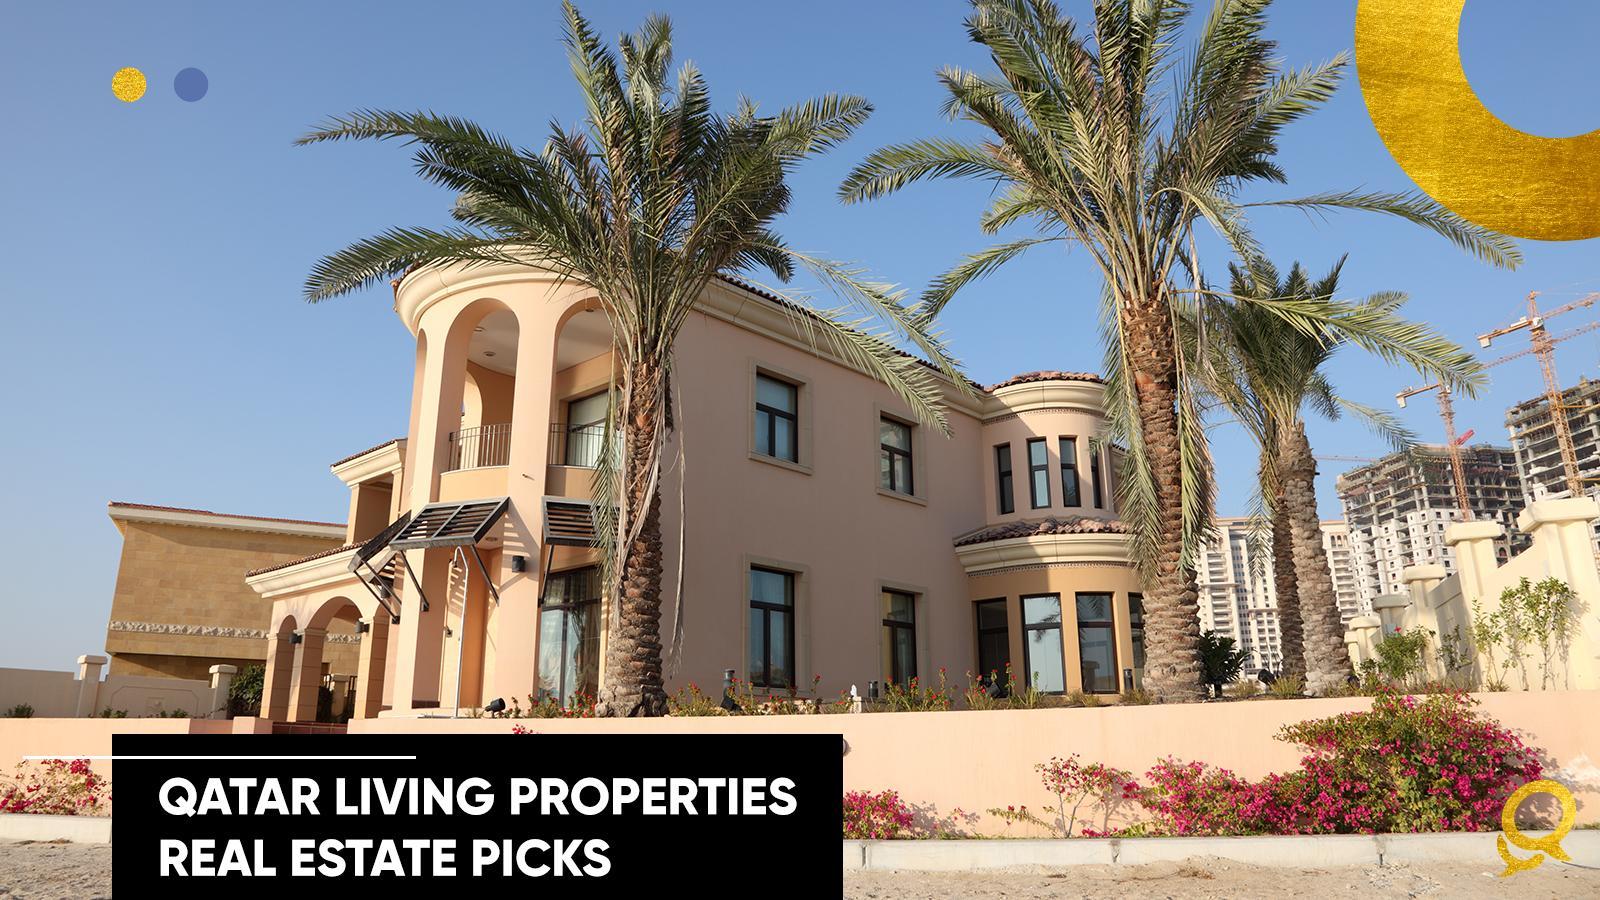 QLP Team's property picks - brilliant real estate deals for April